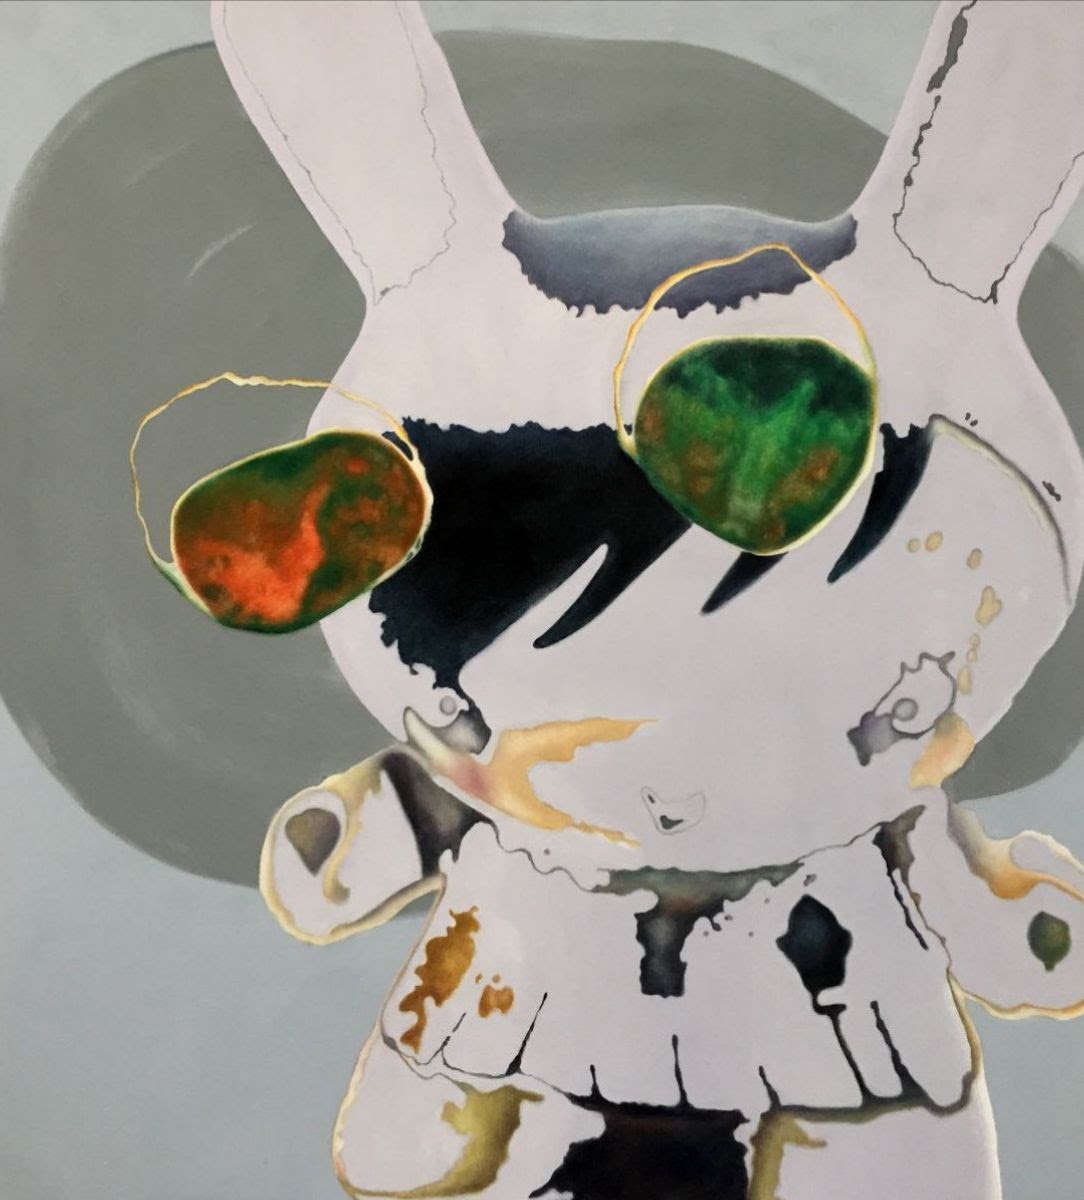 Paintings by Lida Lowrey